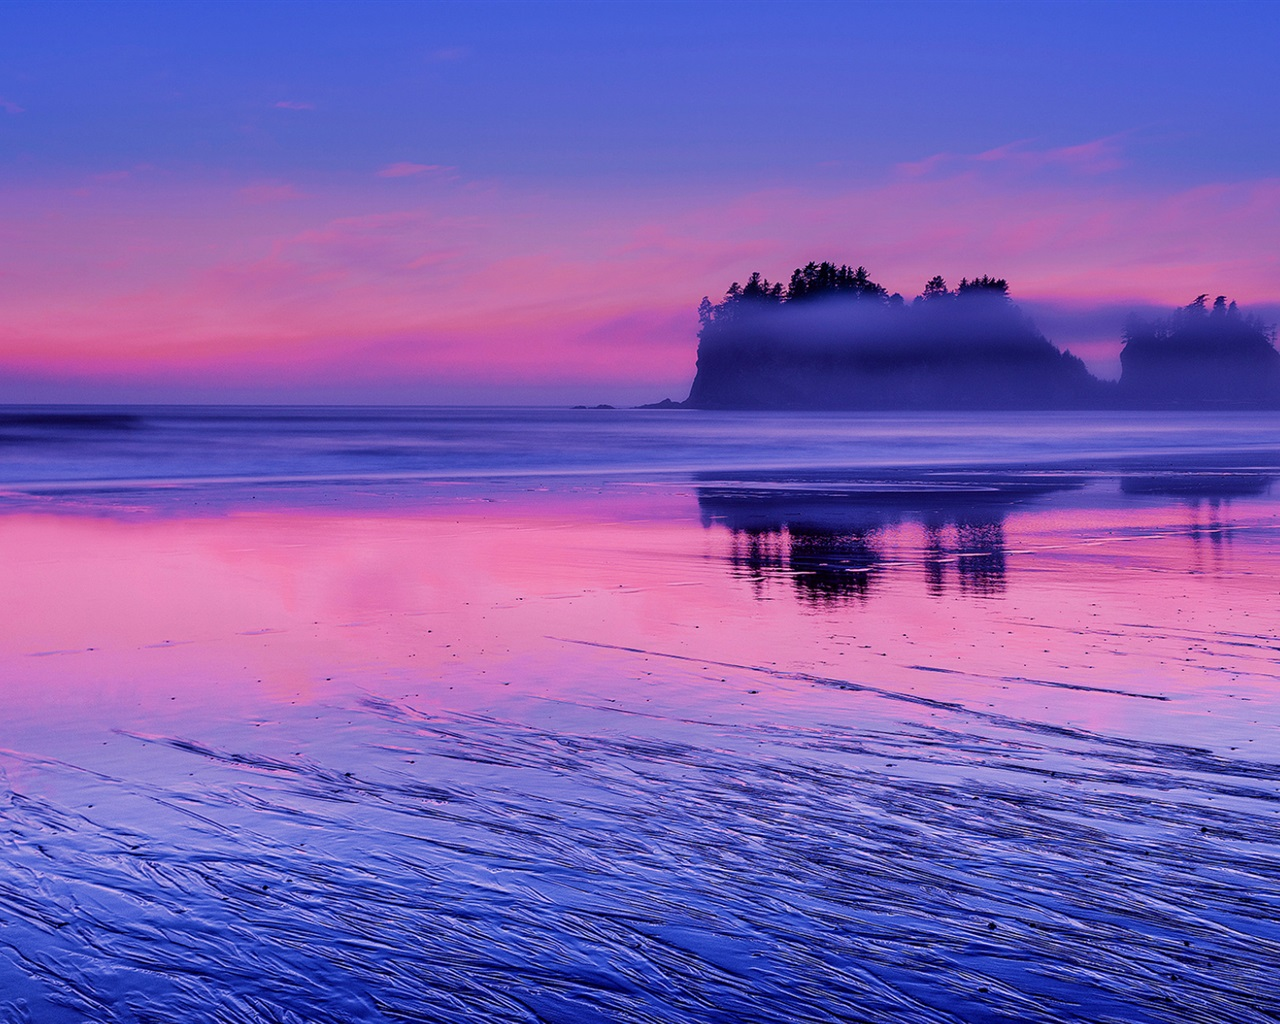 USA, Washington, Pacific ocean, sea water, pink sunset ... Pacific Ocean Water